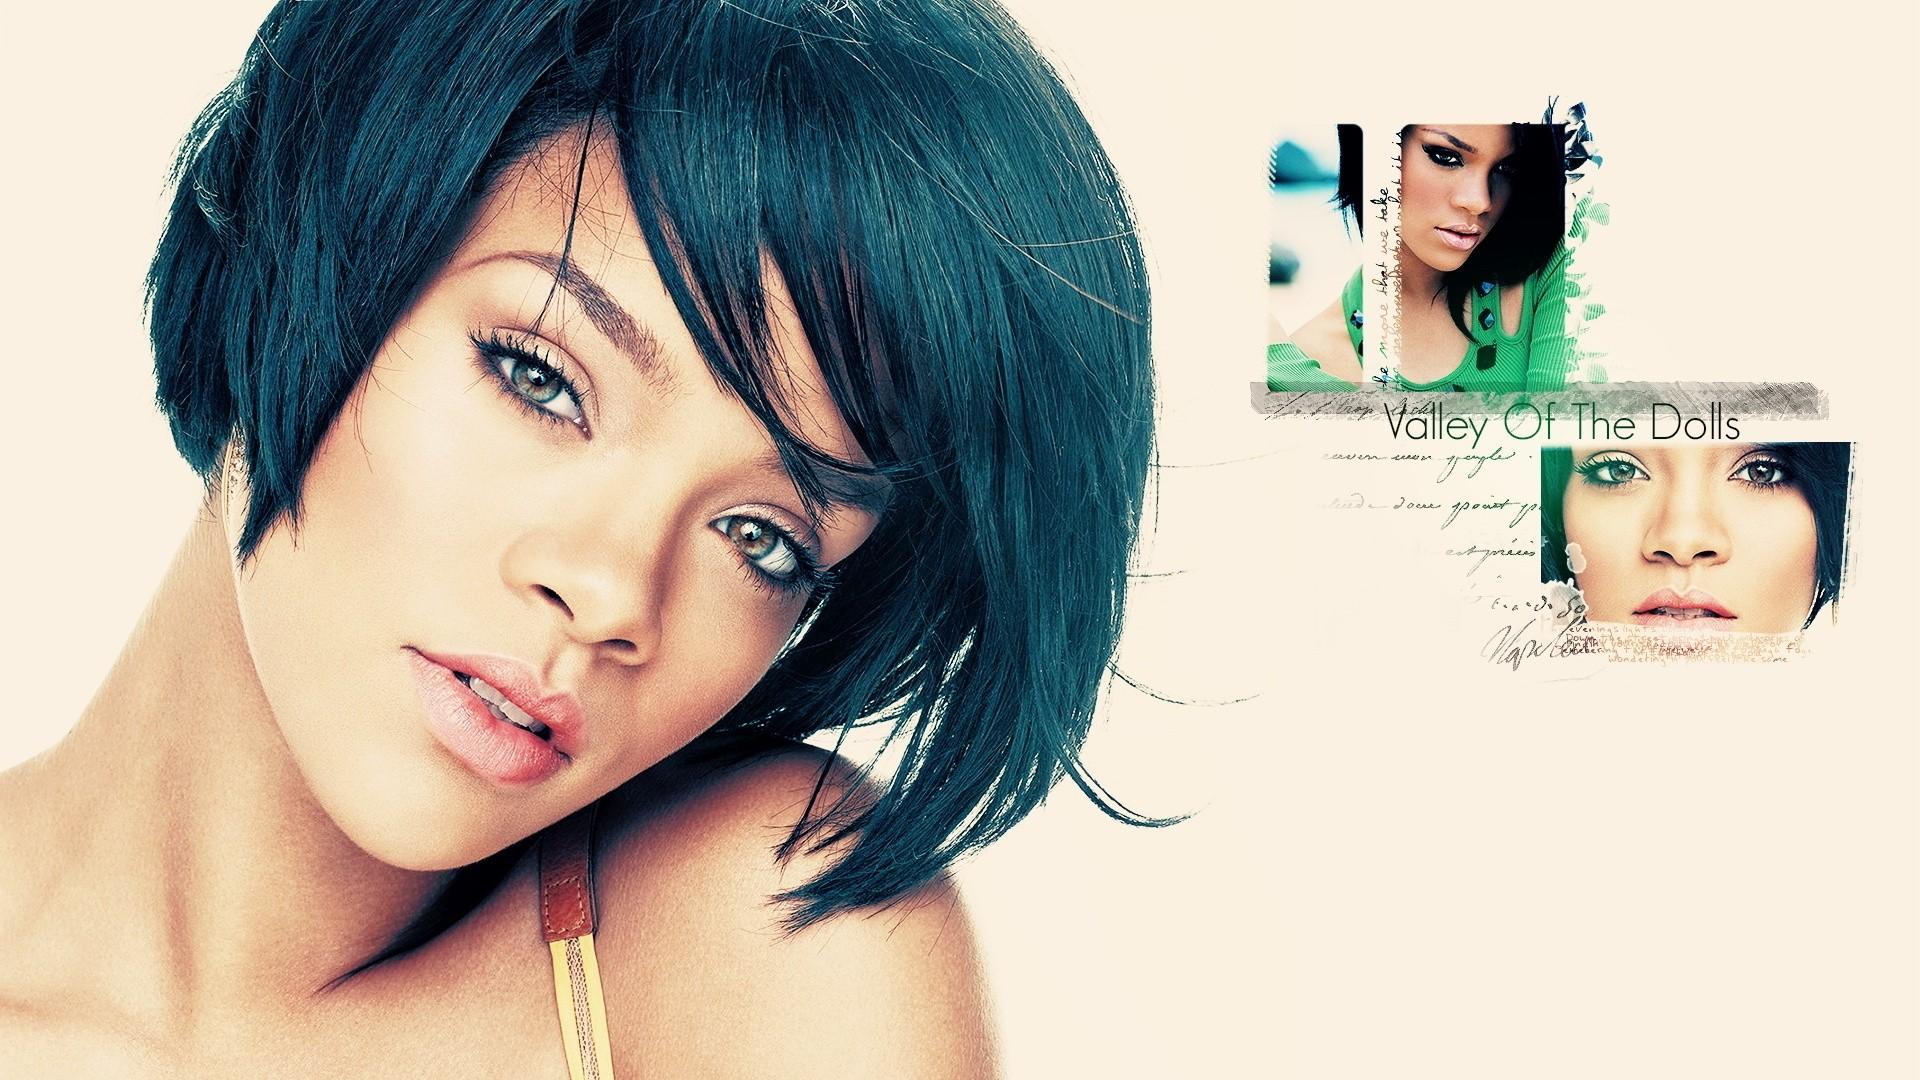 1920x1080 px babes eyes face hip pop POV Rihanna sexy singer women